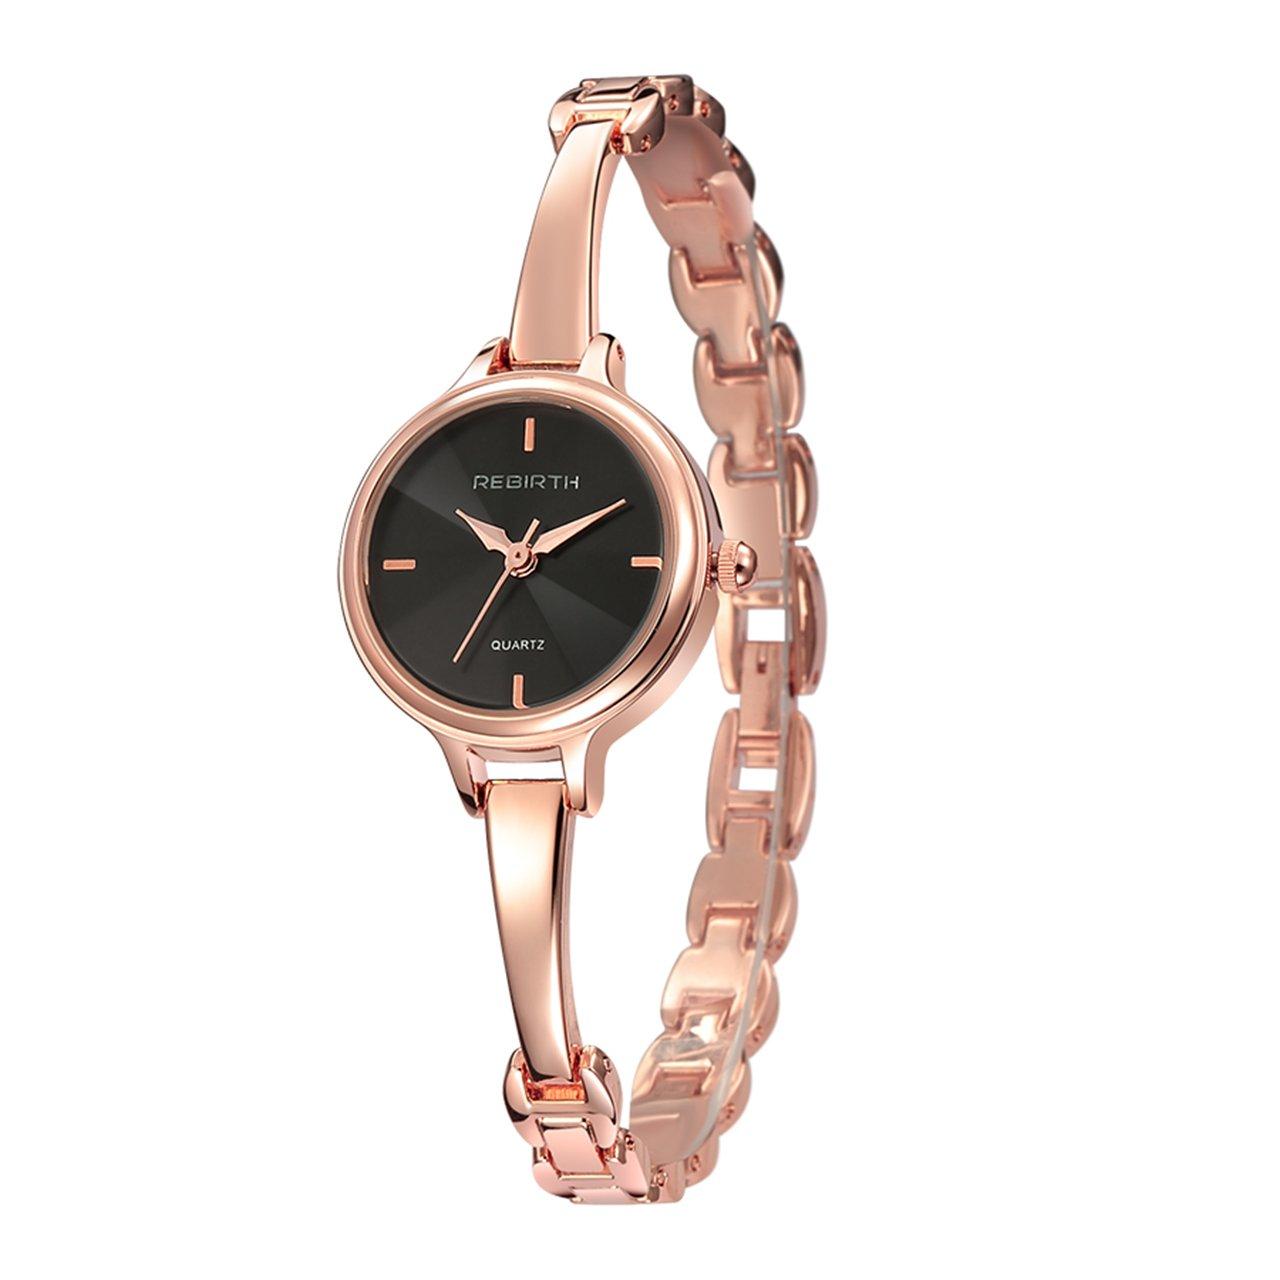 Top Plaza Womens Elegant Rose Gold Luxury Dress Bracelet Cuff Bangle Wrist Watch Analog Quartz 3 ATM Waterproof(Black Dial)